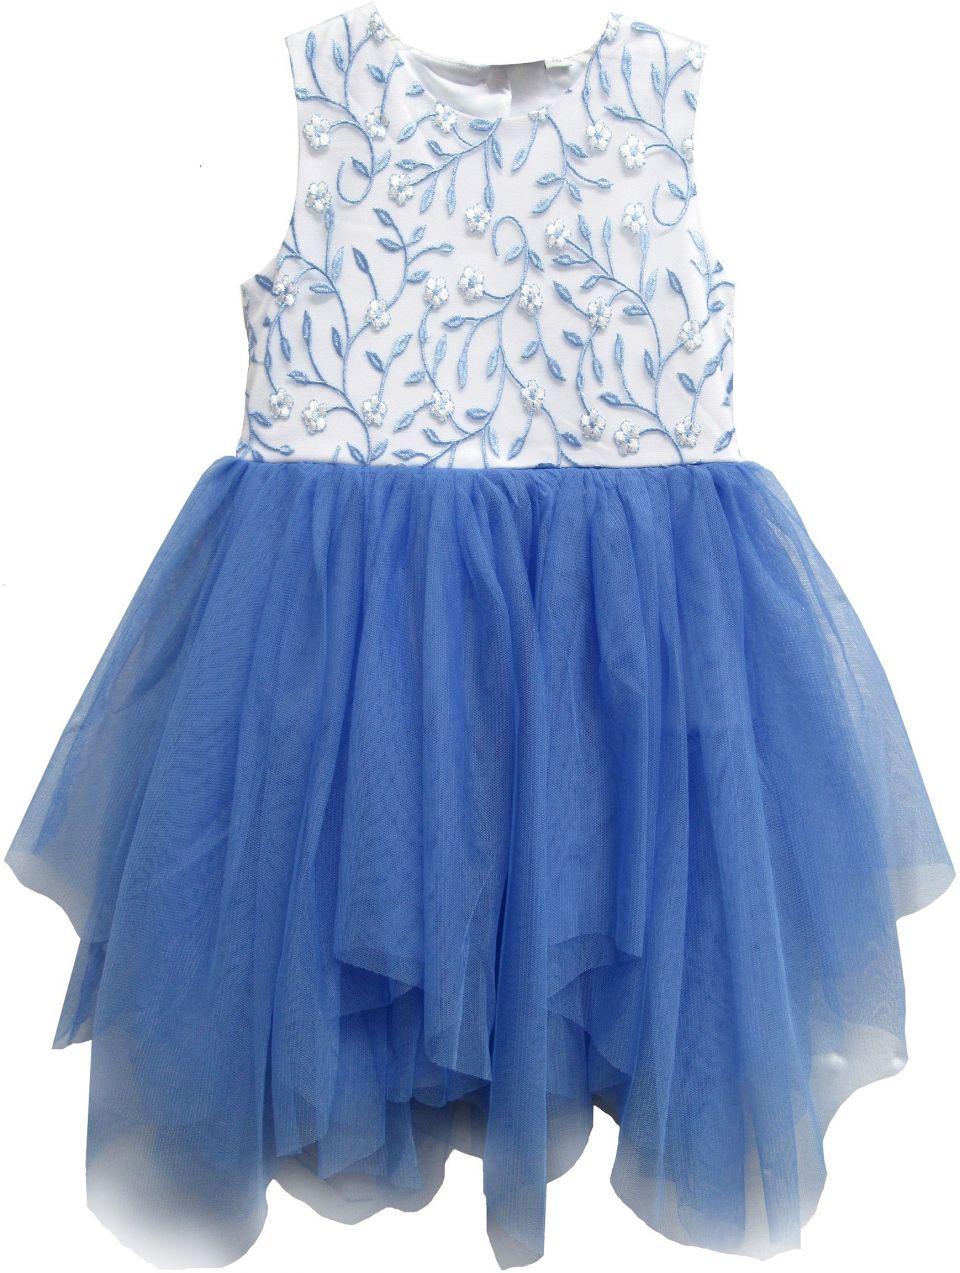 Topo Dievčenské šaty - bielo-modré značky Topo - Lovely.sk 05356162ec4